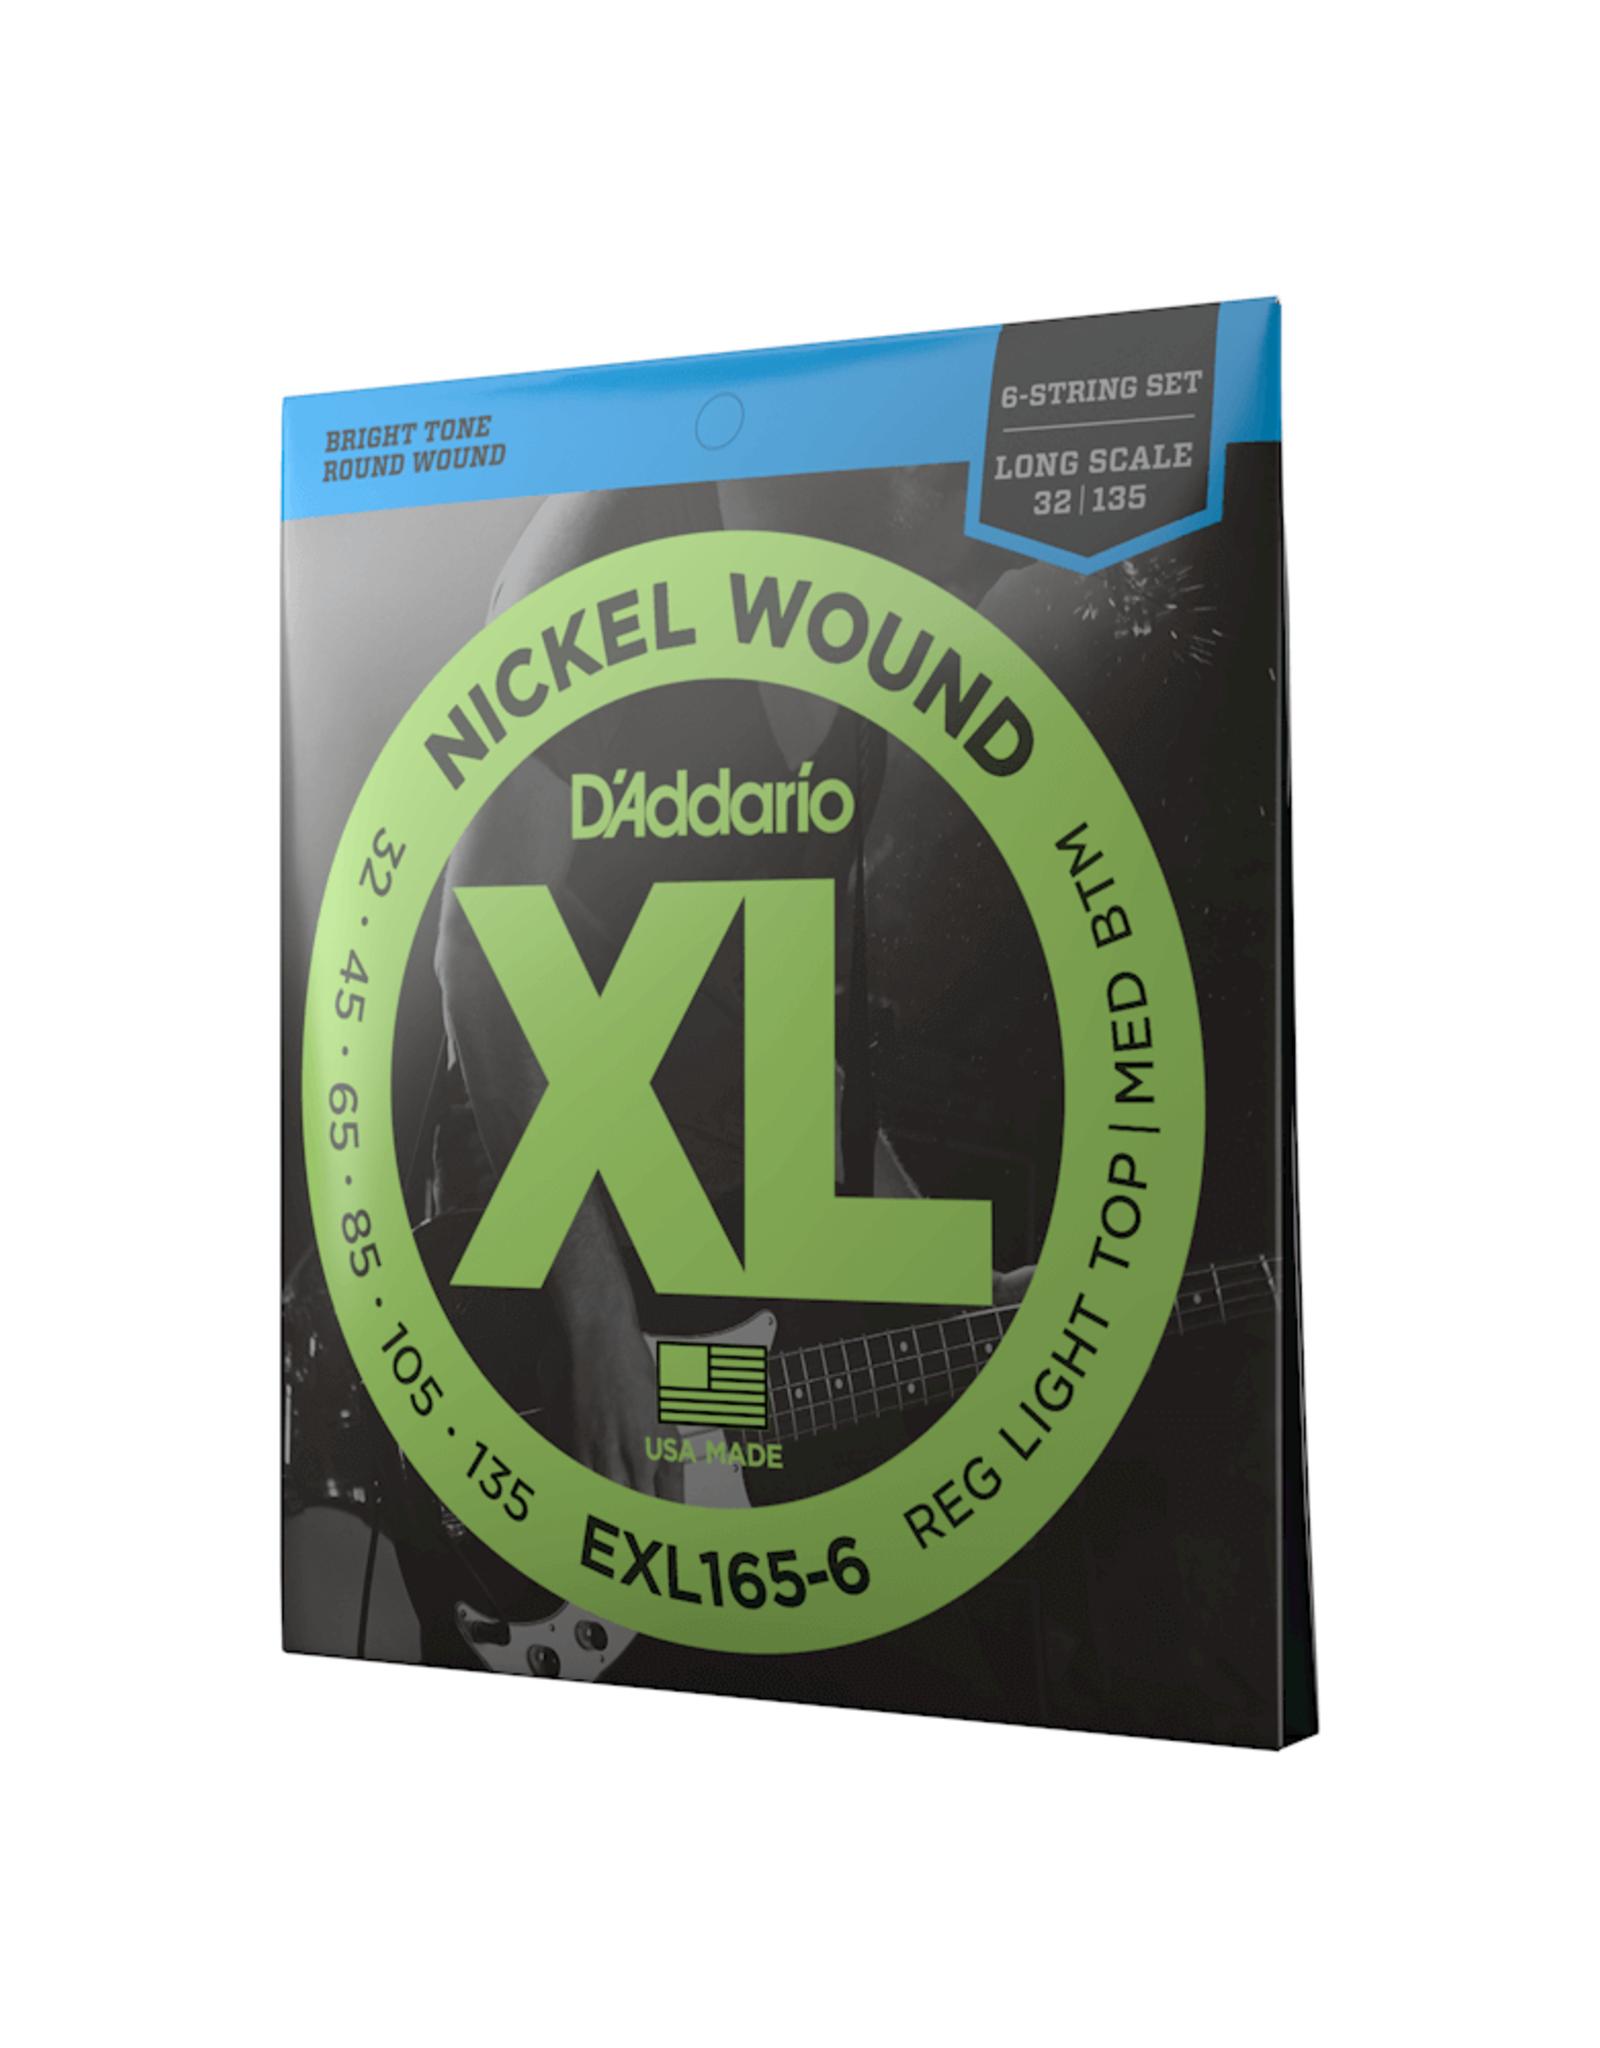 D'Addario D'Addario EXL165-6 6-String Nickel Wound Bass Guitar Strings, Custom Light, 32-135, Long Scale